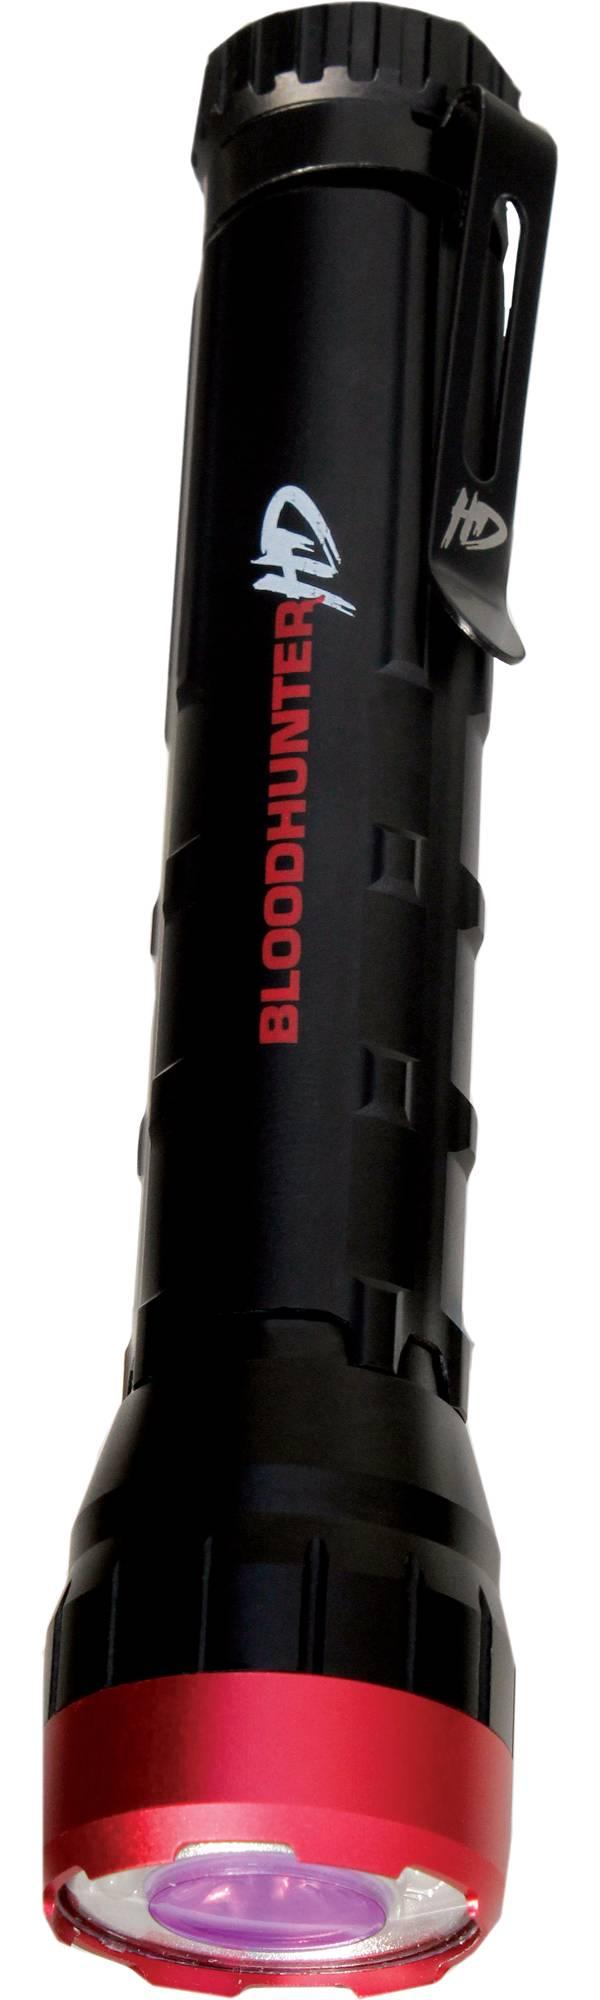 Primos Blooodhunter HD Pocket Light product image